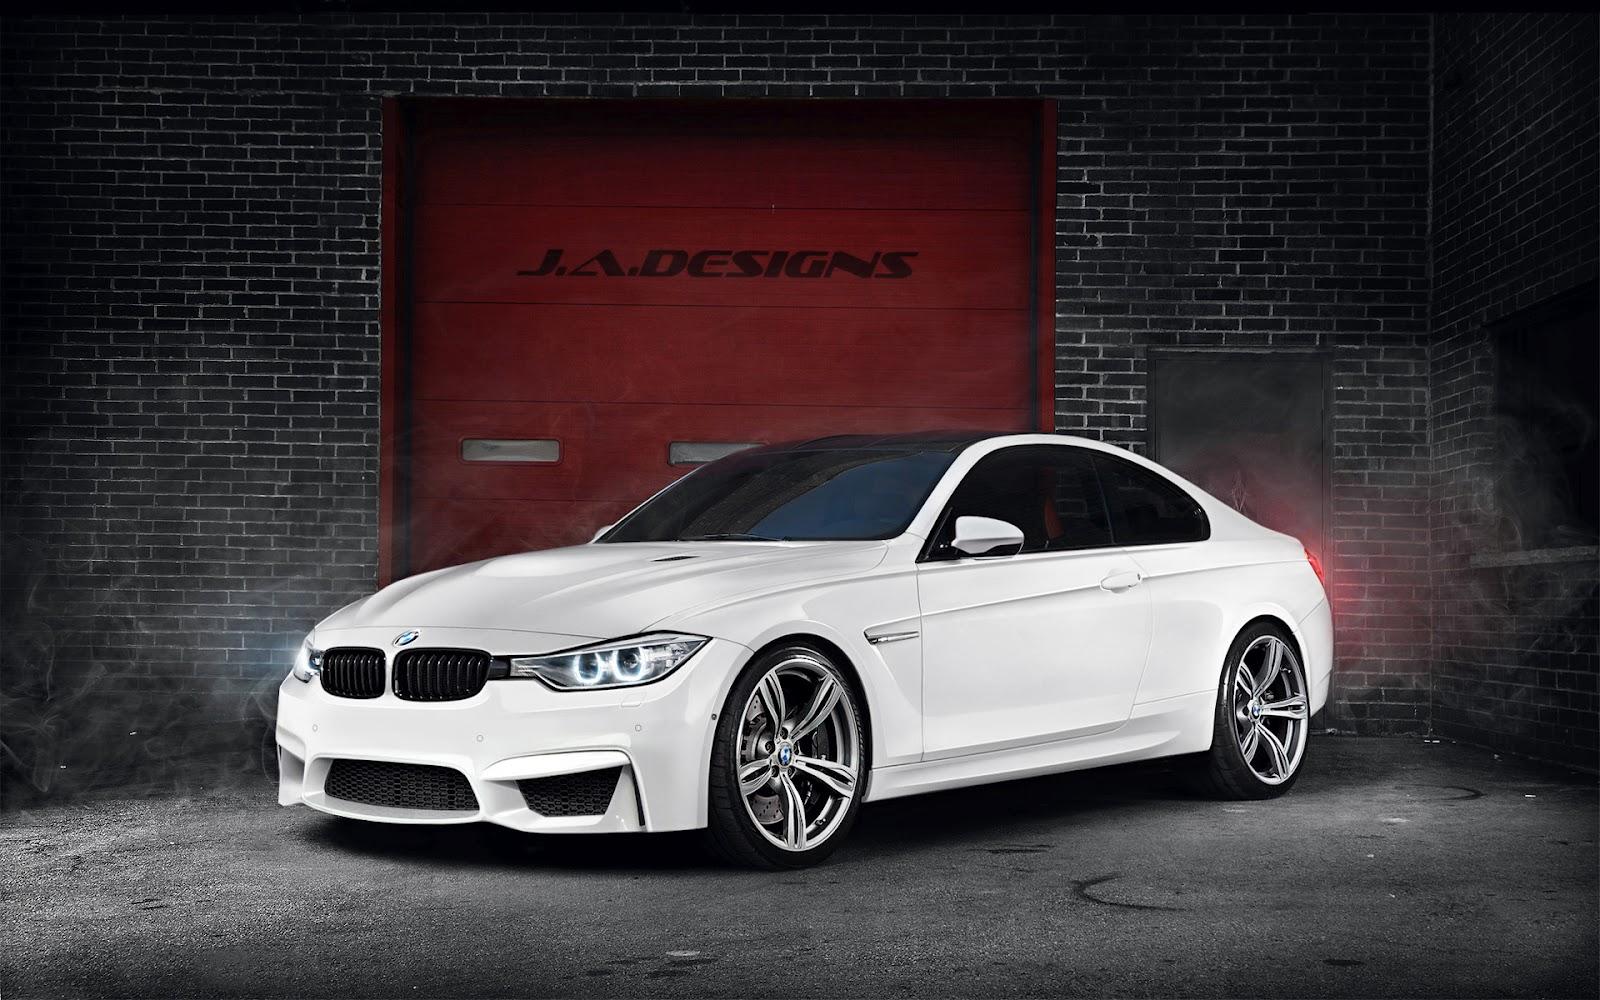 Fondos de Pantalla de Carros: BMW M4 F82 Coupe 2015 Concept Car